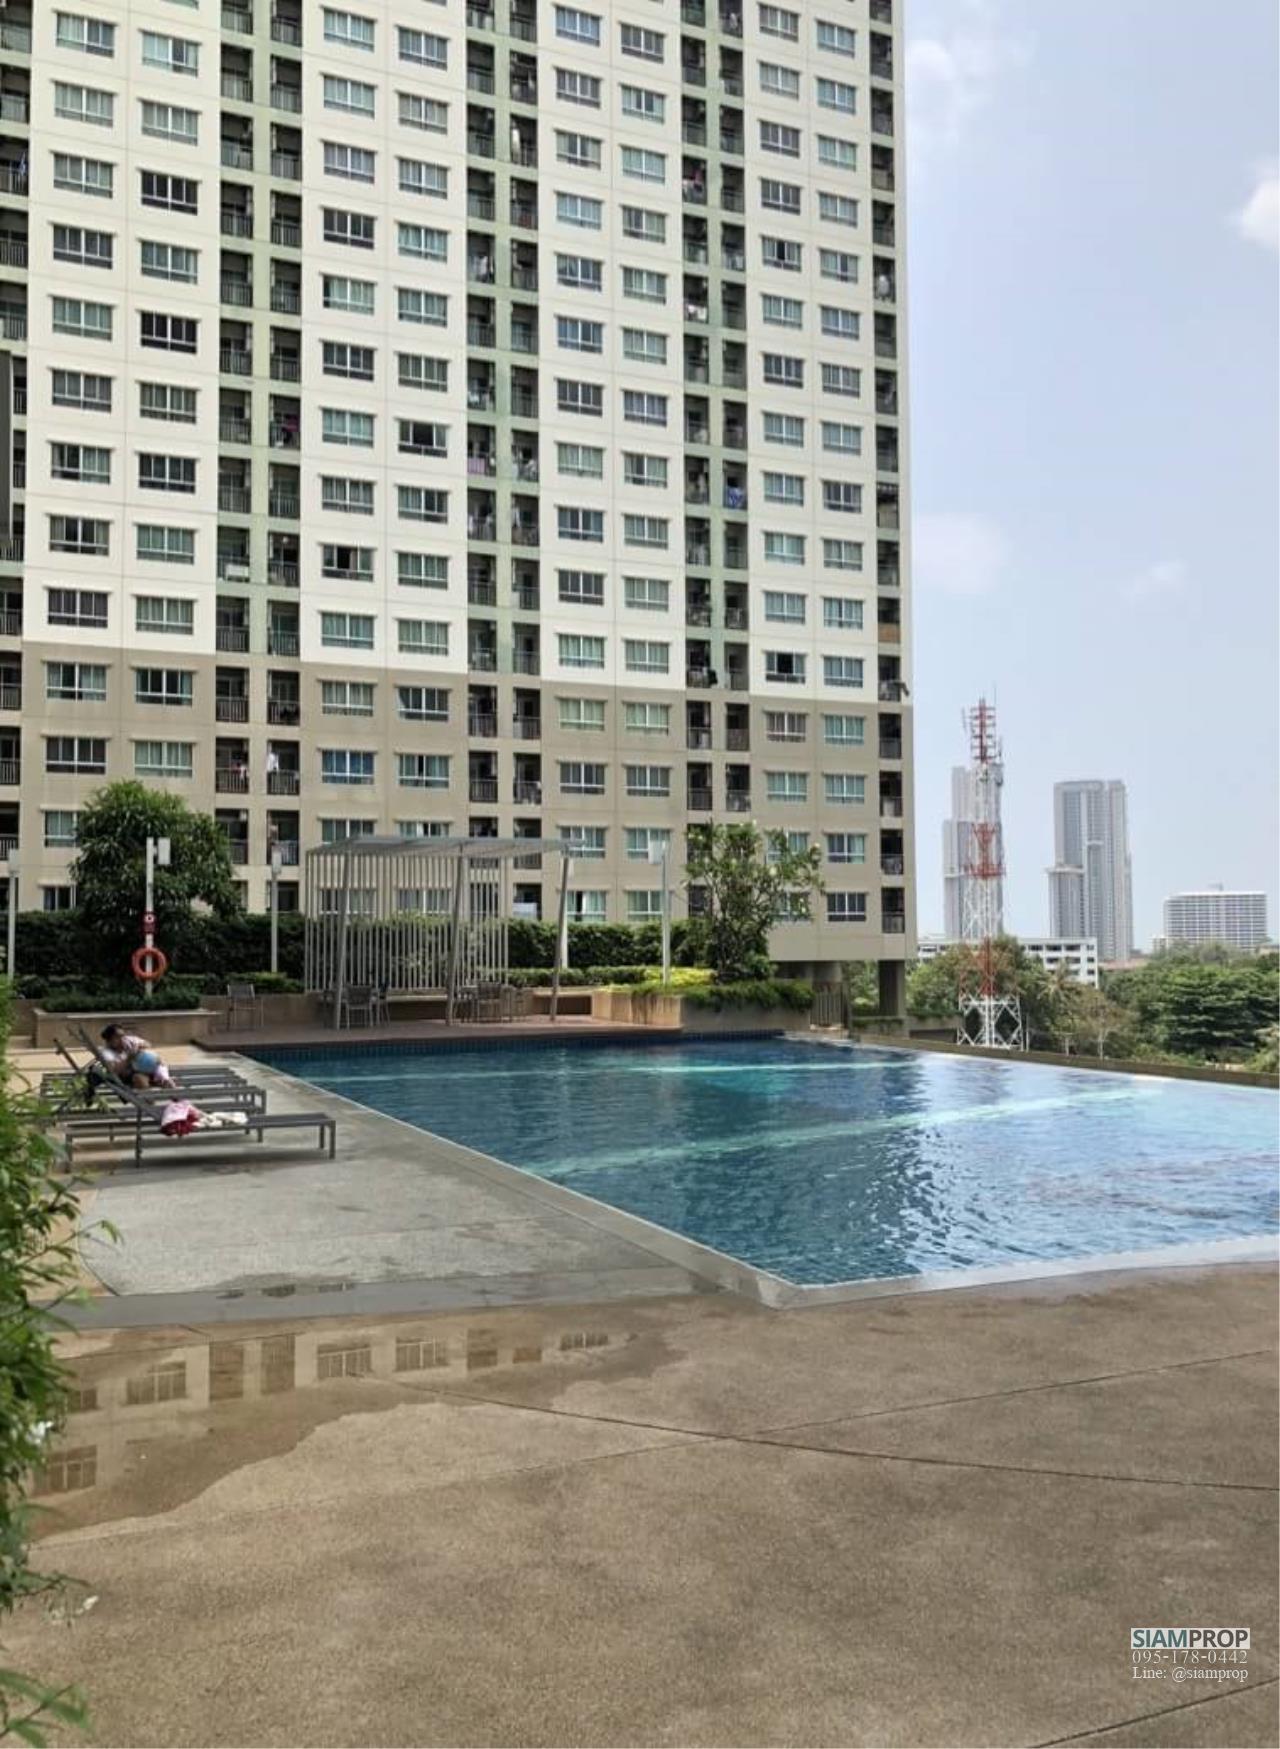 Siam Prop Agency's Lumpini Ville Naklua-Wongamat 9